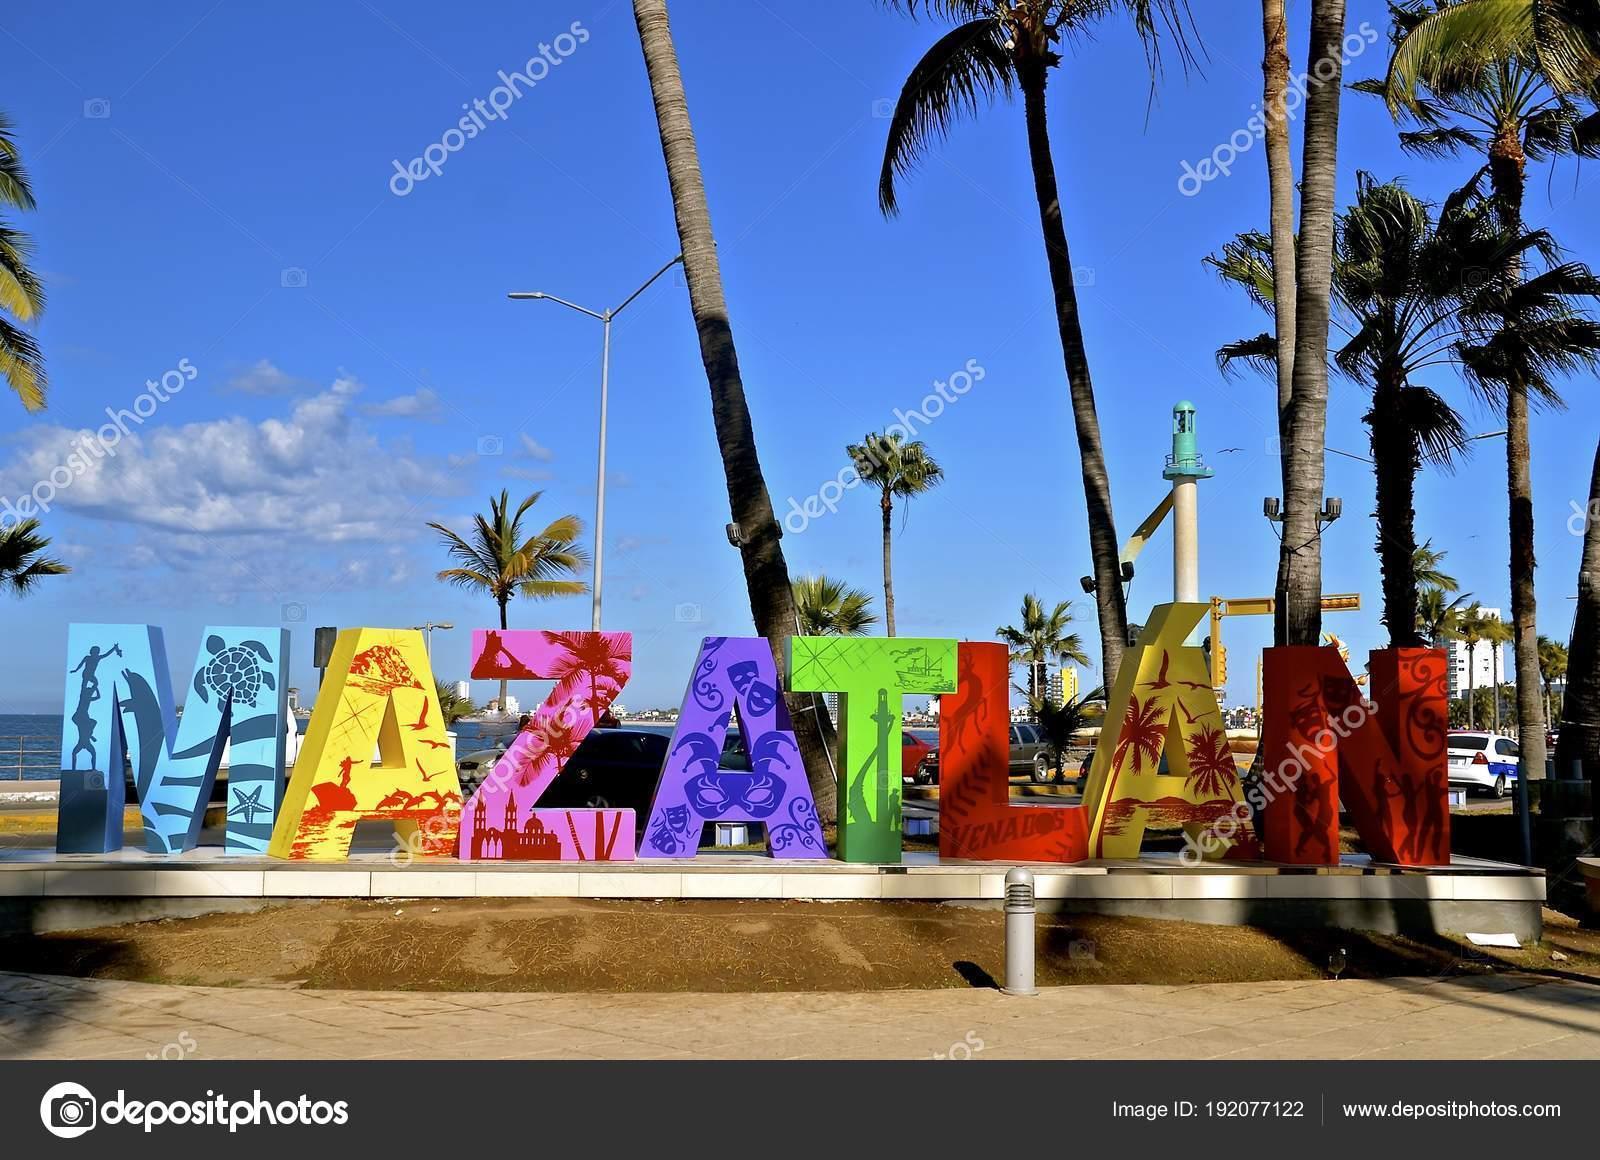 mazatlan mexico january 2017 letters mazatlan art work welcome